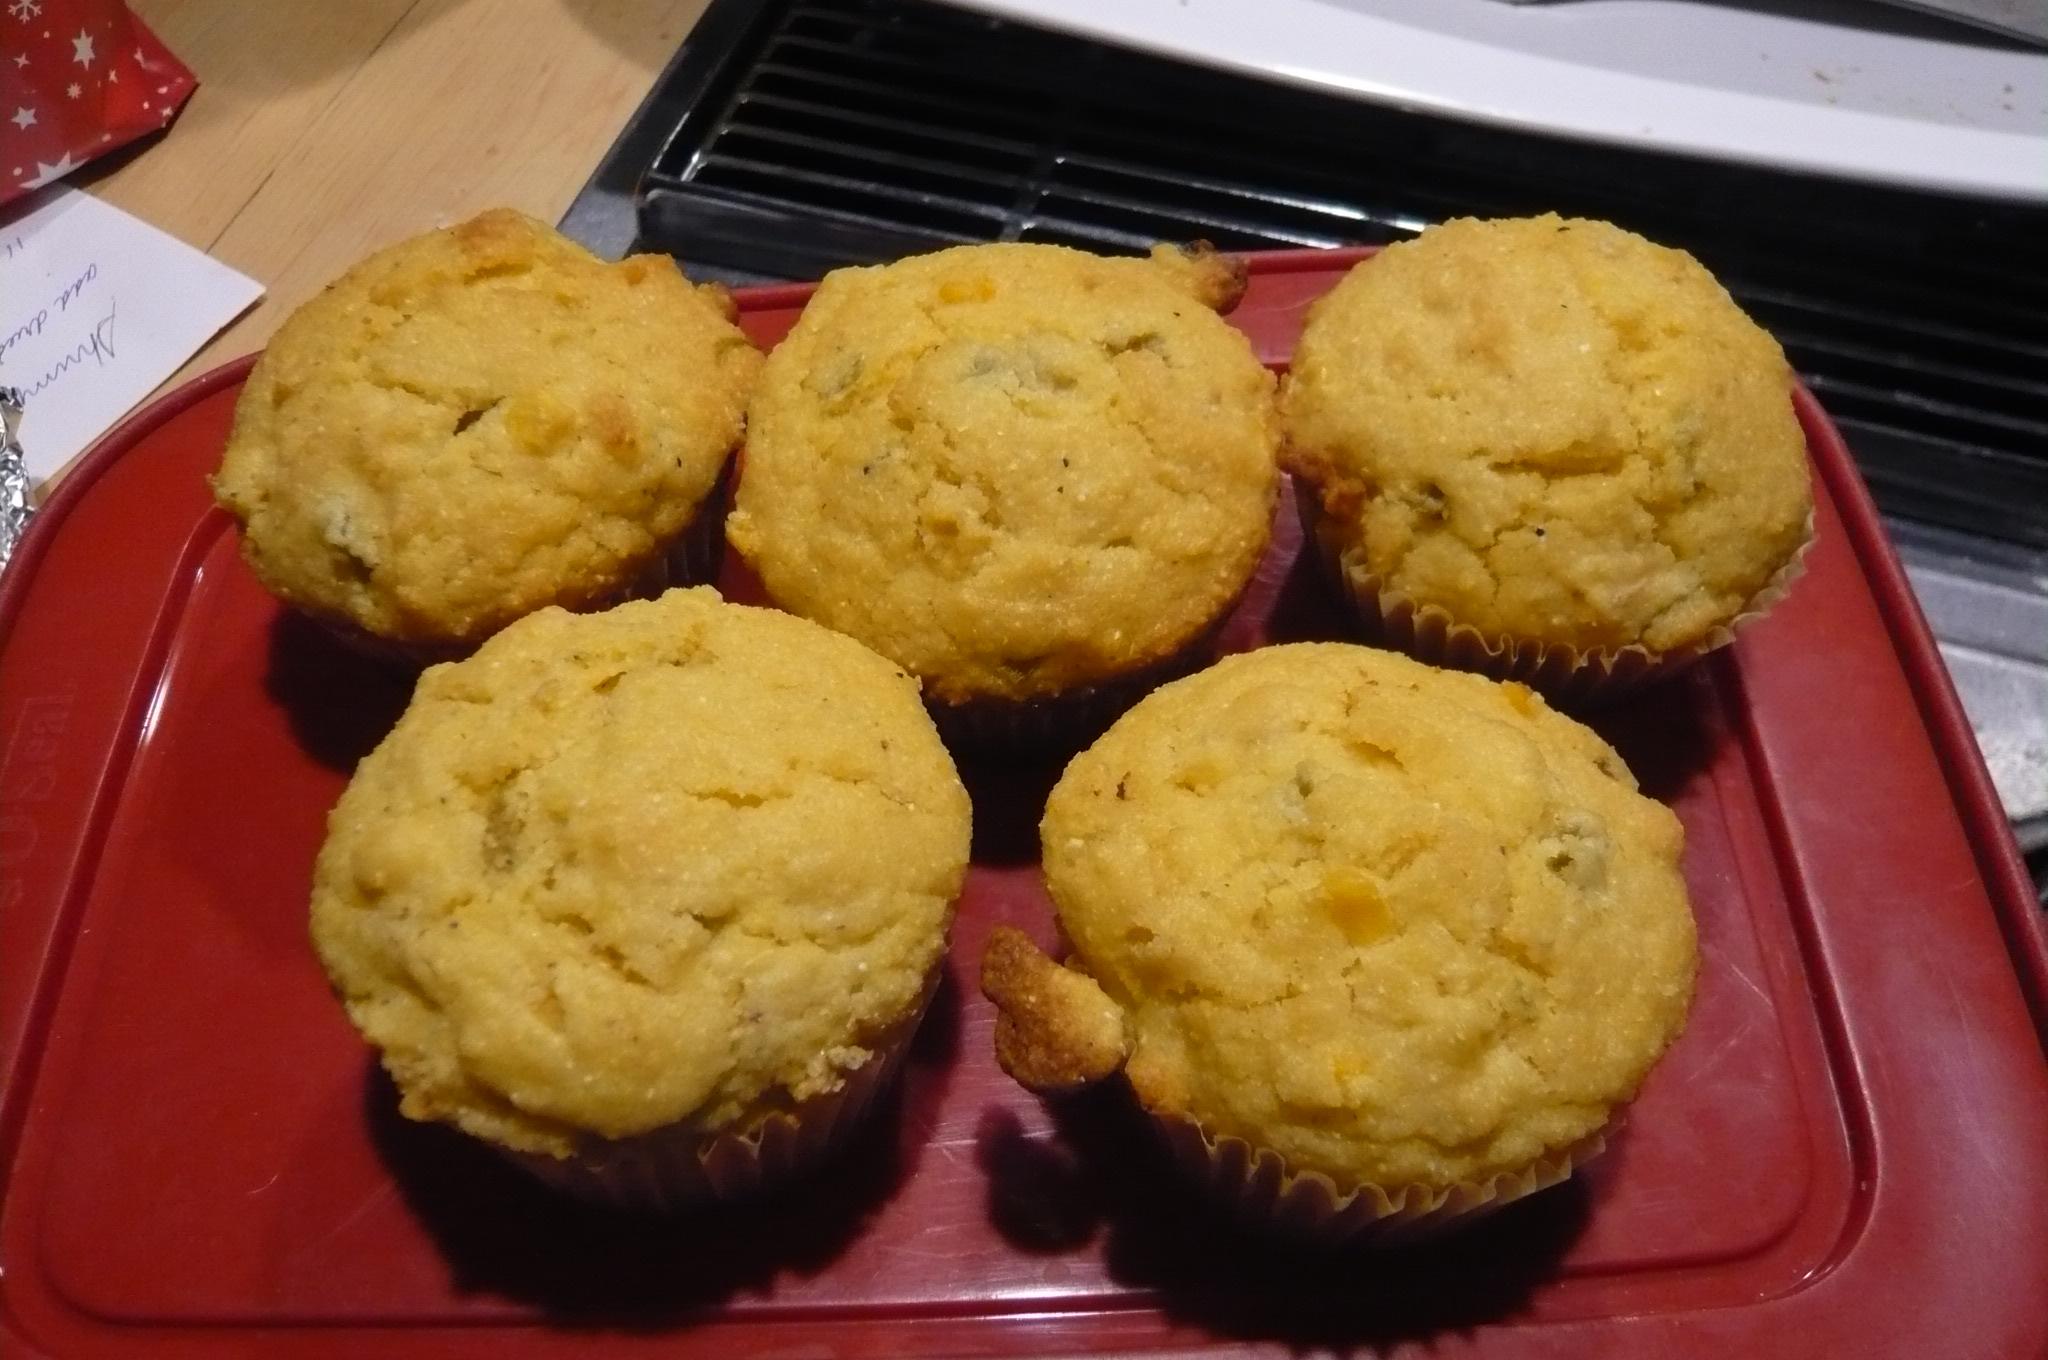 Savory Corn Muffins Jan Mowbray